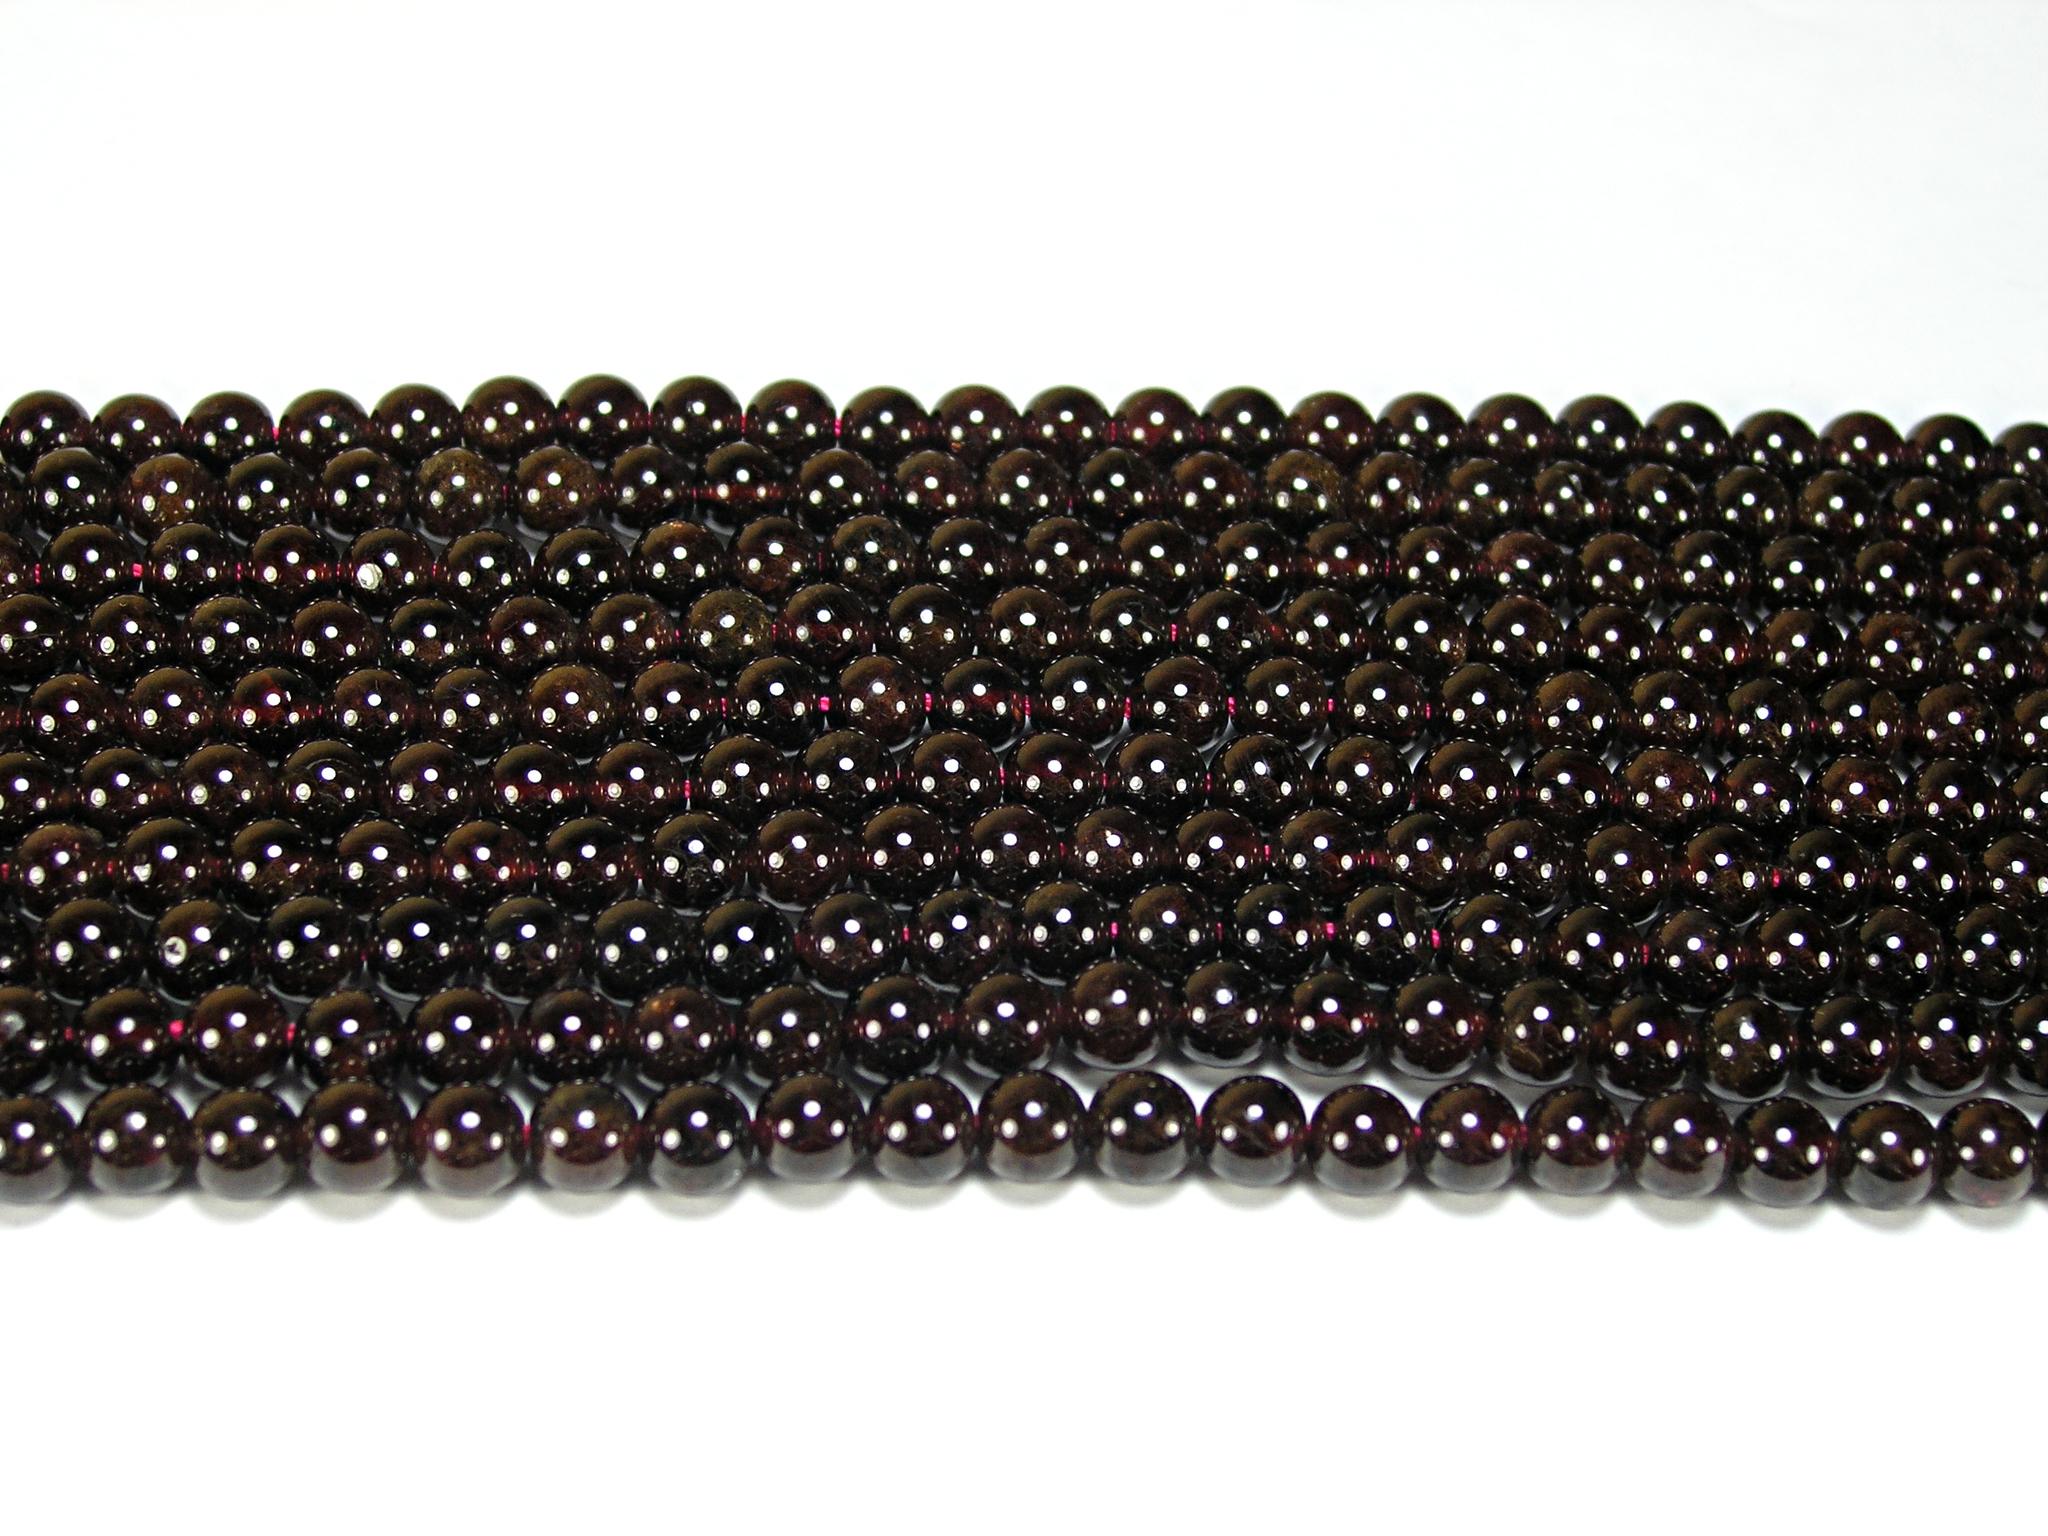 Нить бусин из граната (альмандина), шар гладкий 6мм